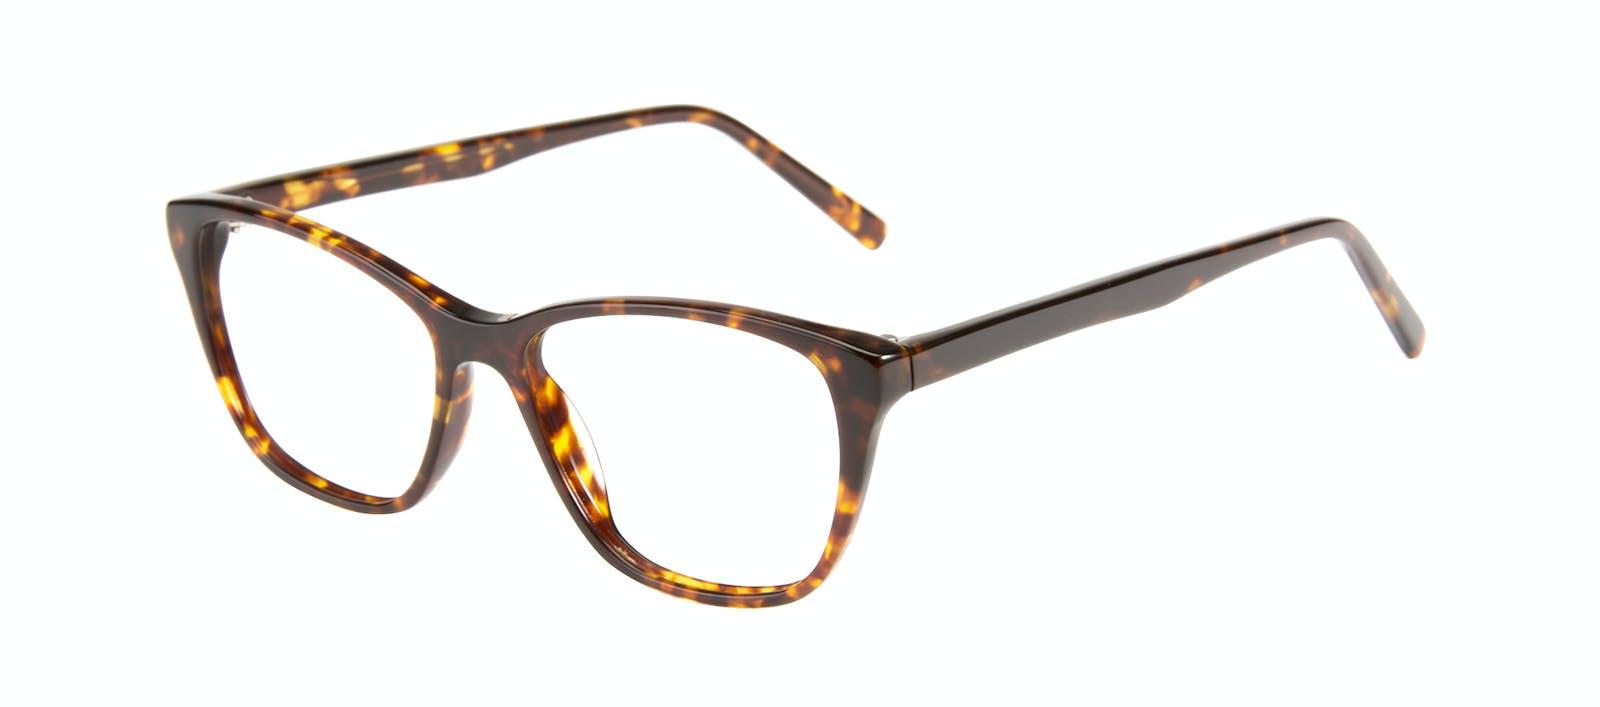 dcbd550bfca9 Affordable Fashion Glasses Cat Eye Eyeglasses Women Myrtle Petite Sepia Kiss  Tilt